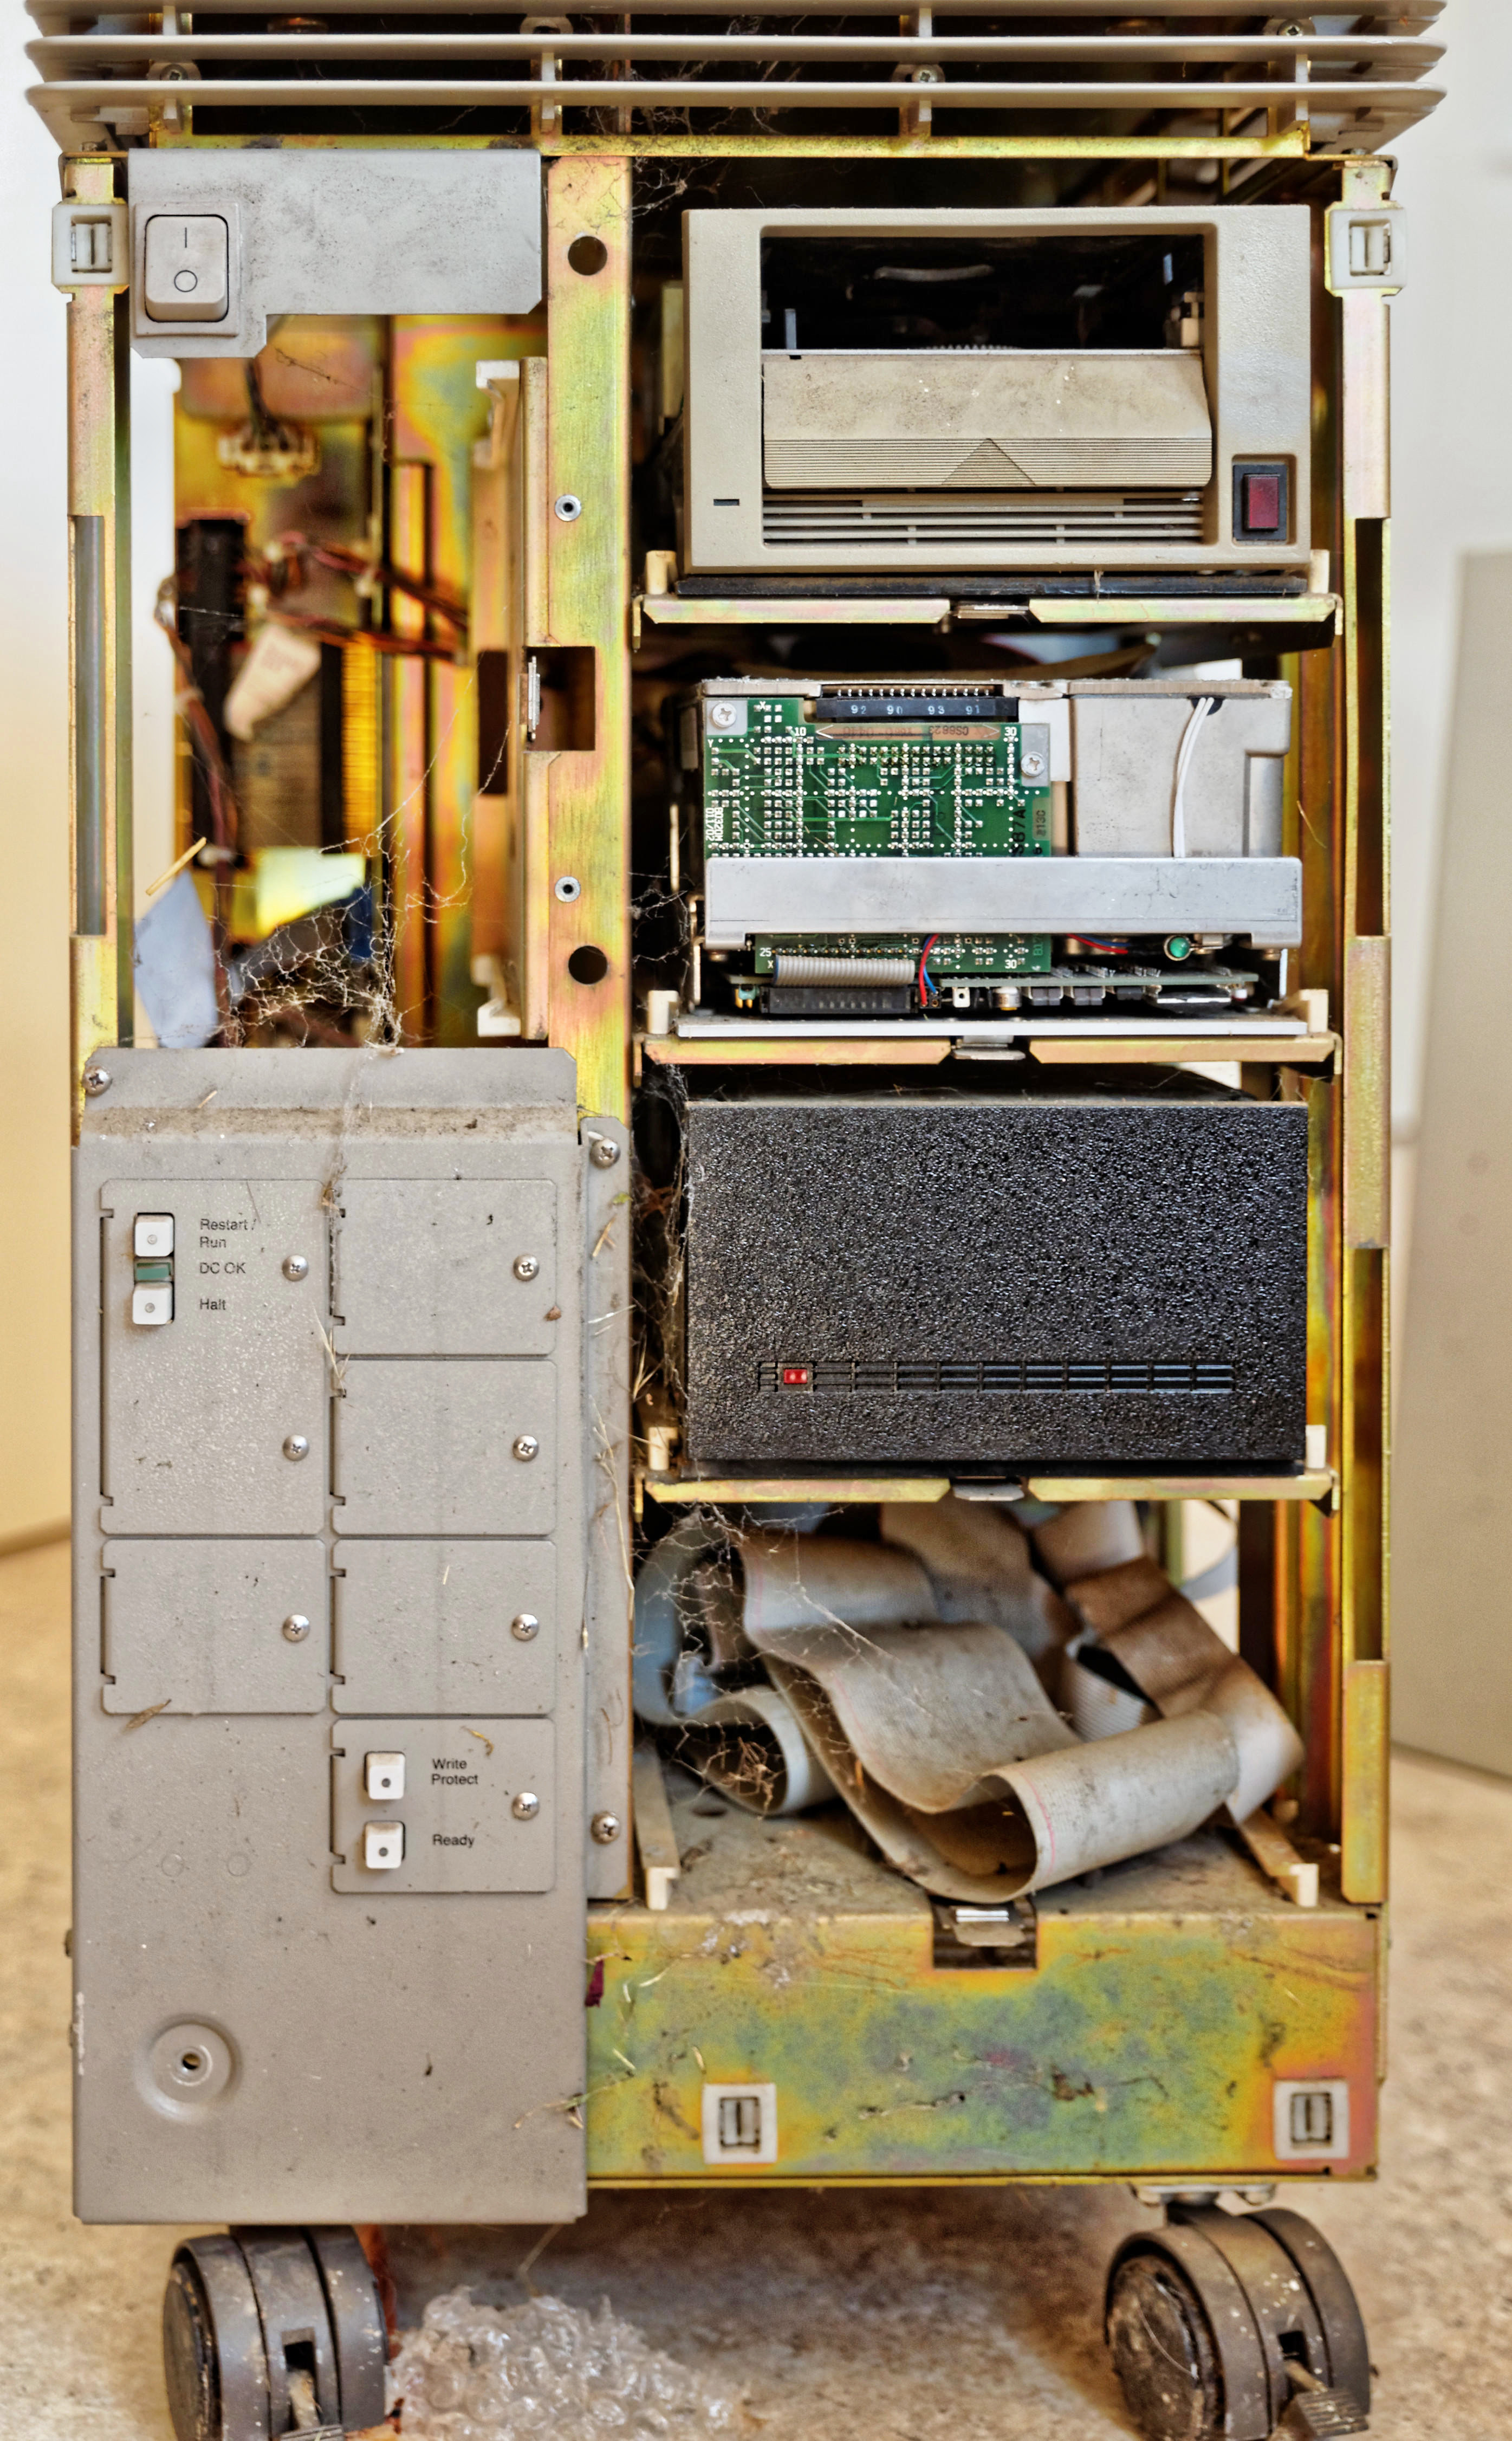 MicroVAX-II-5.jpeg